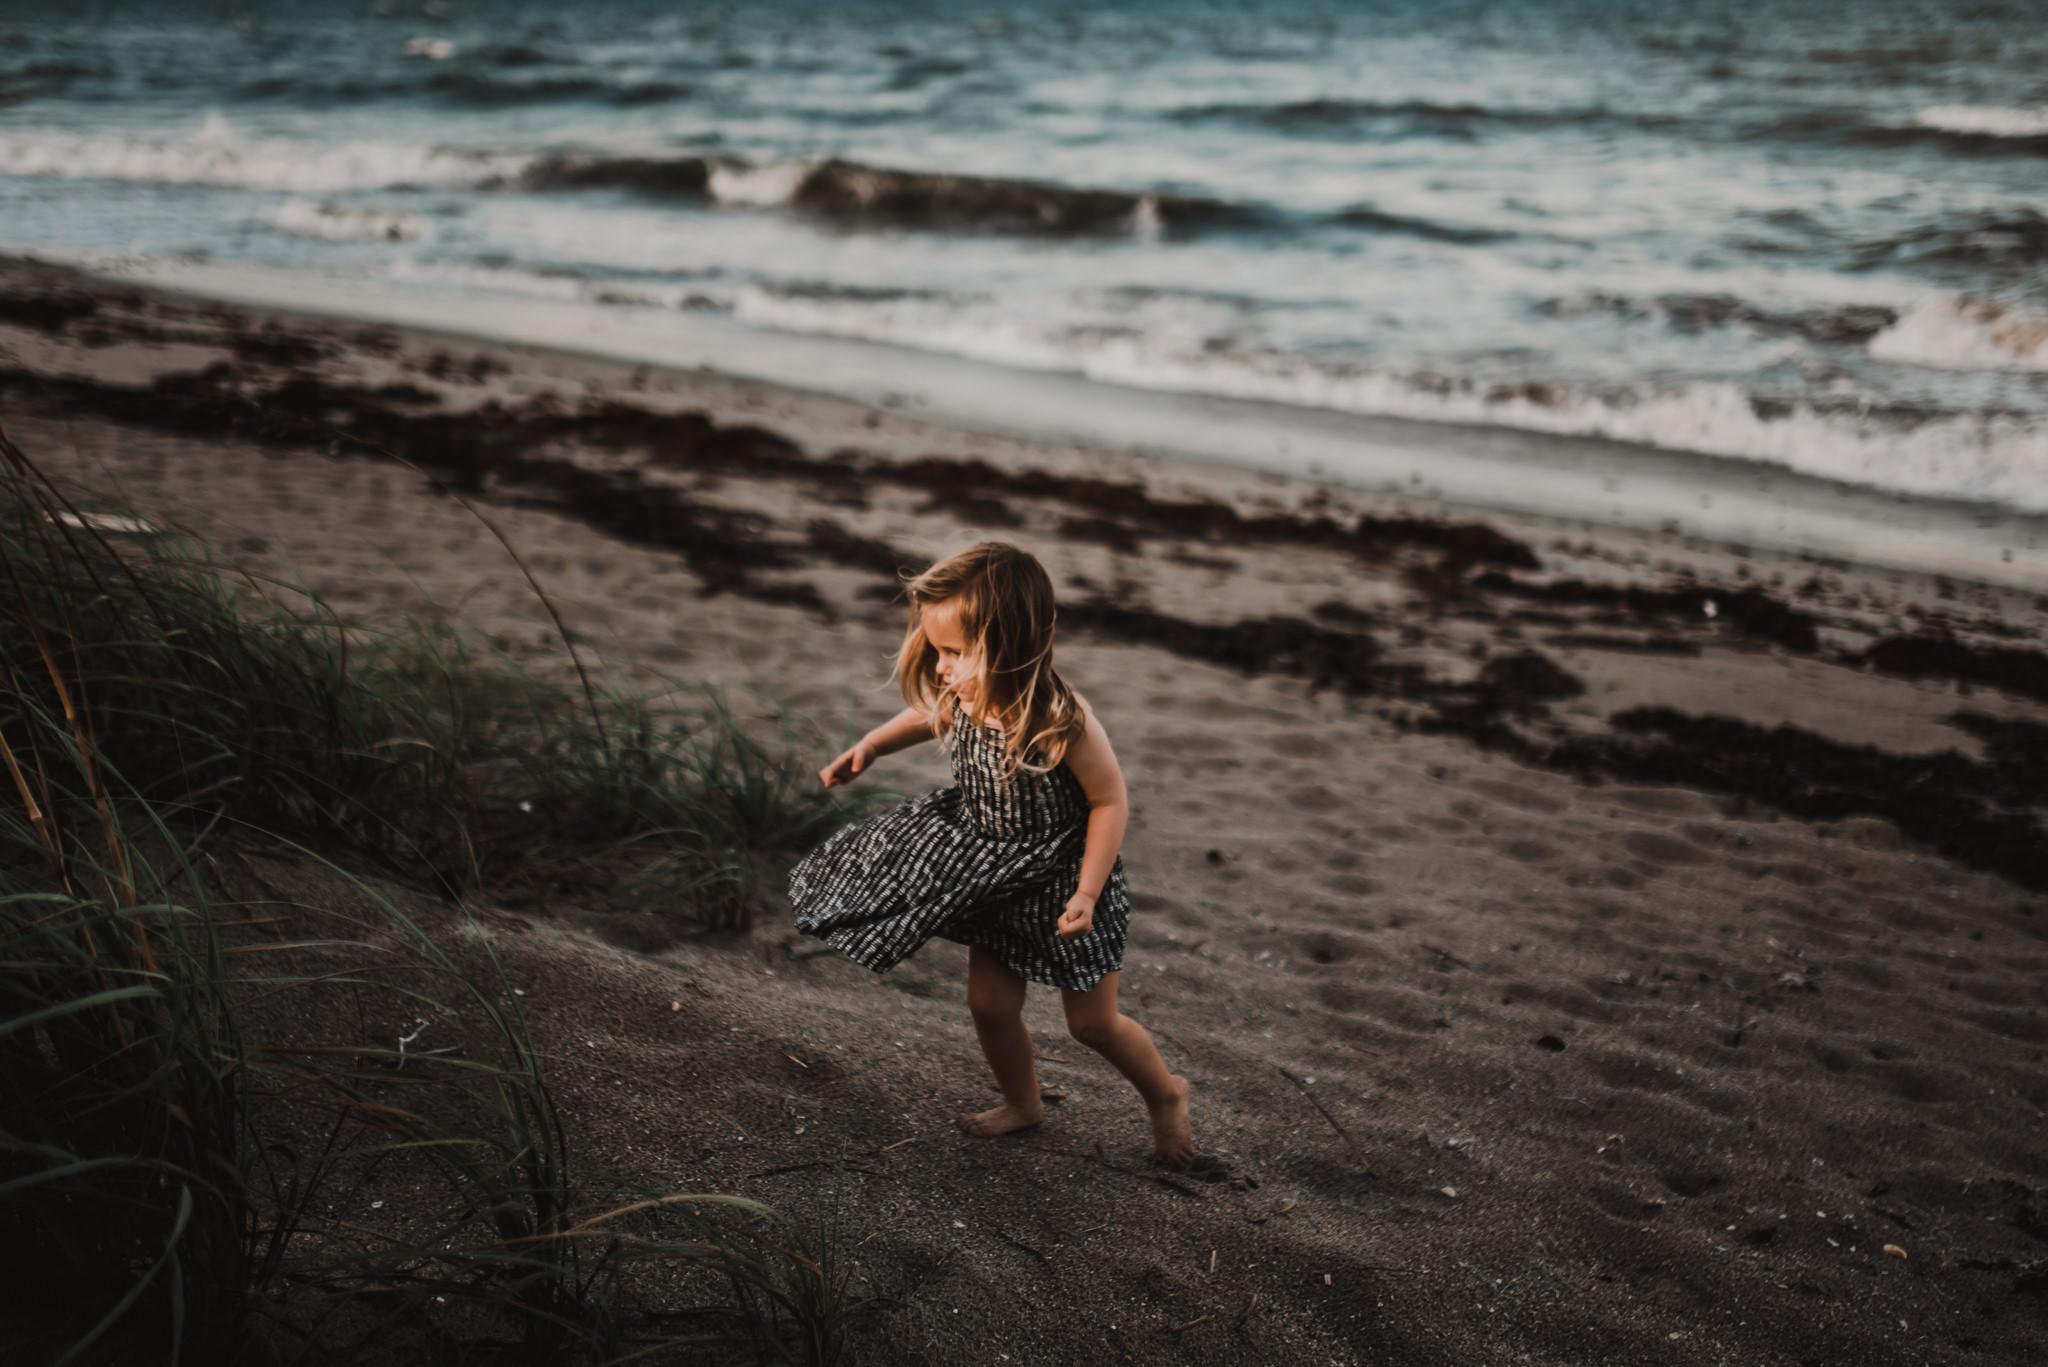 twyla jones photography - treasure coast florida - josh and everly--46.jpg